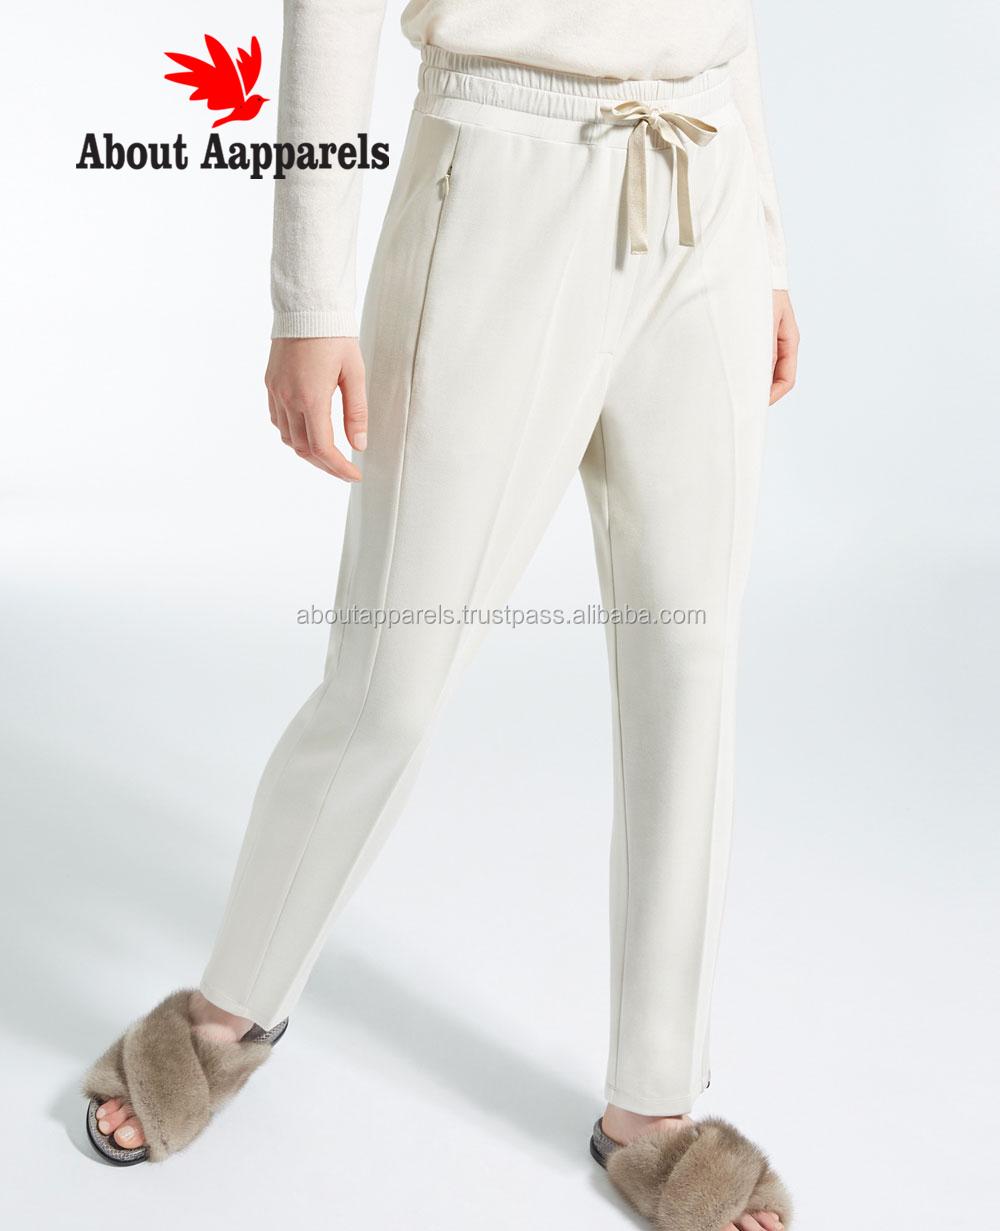 Pantalones Ajustados Para Mujer Pantalon De Otono Para Exteriores Buy Hot Sales New Style Pants High Waist Ladies Loose Pants Sexy Pants For Women New Model Pants Zebra Style Hot Pants Oem Clothing China Trousers